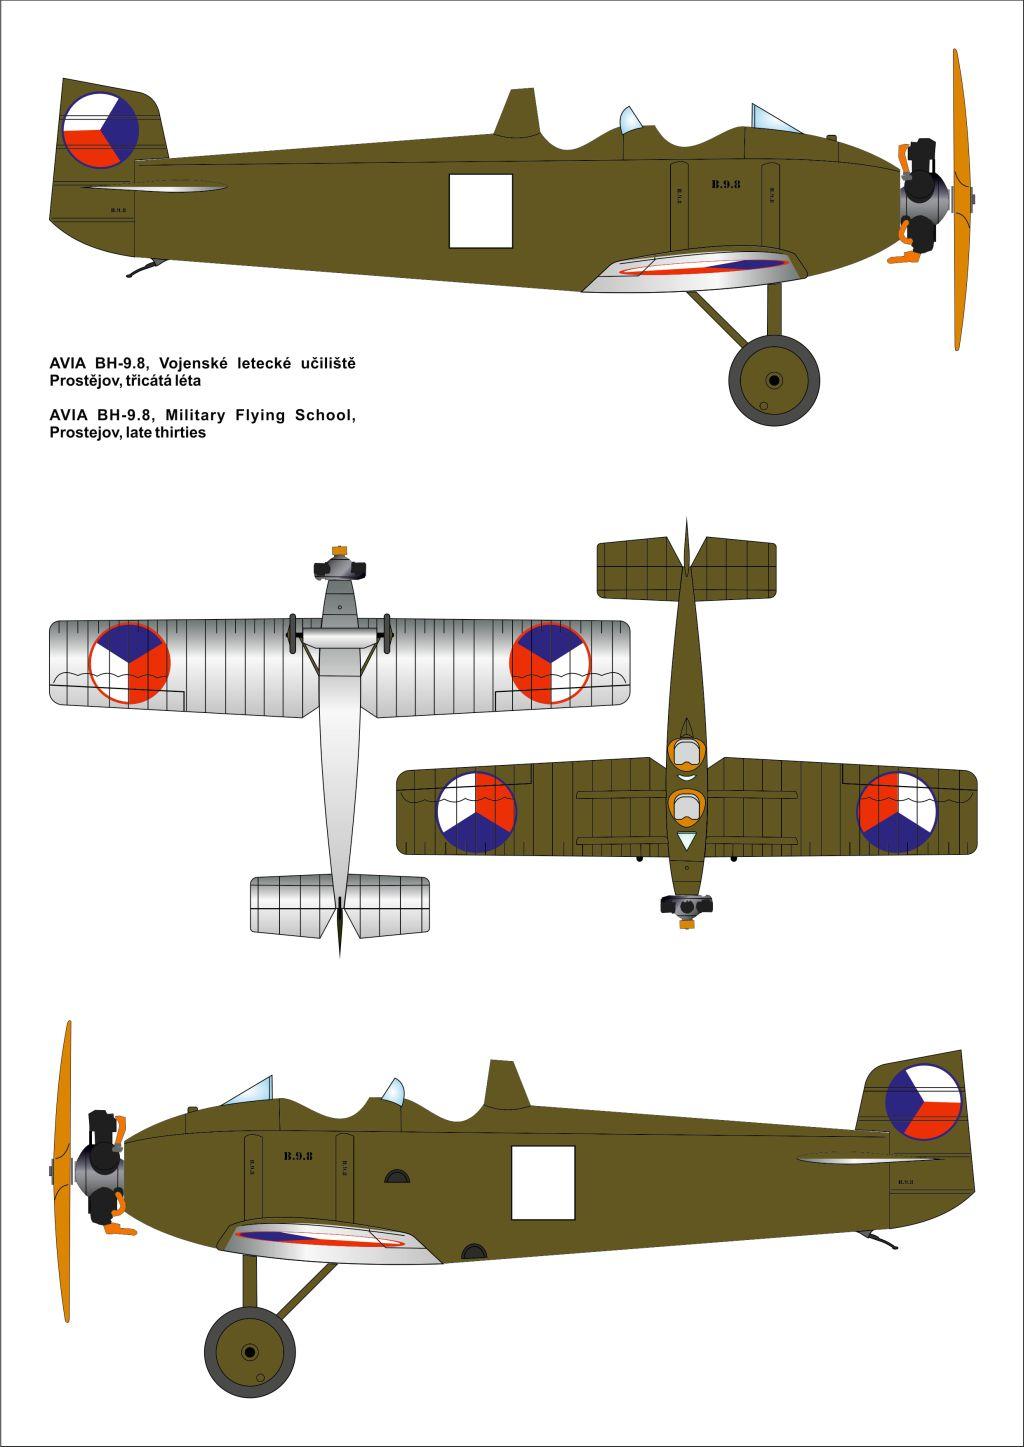 bh-9-5